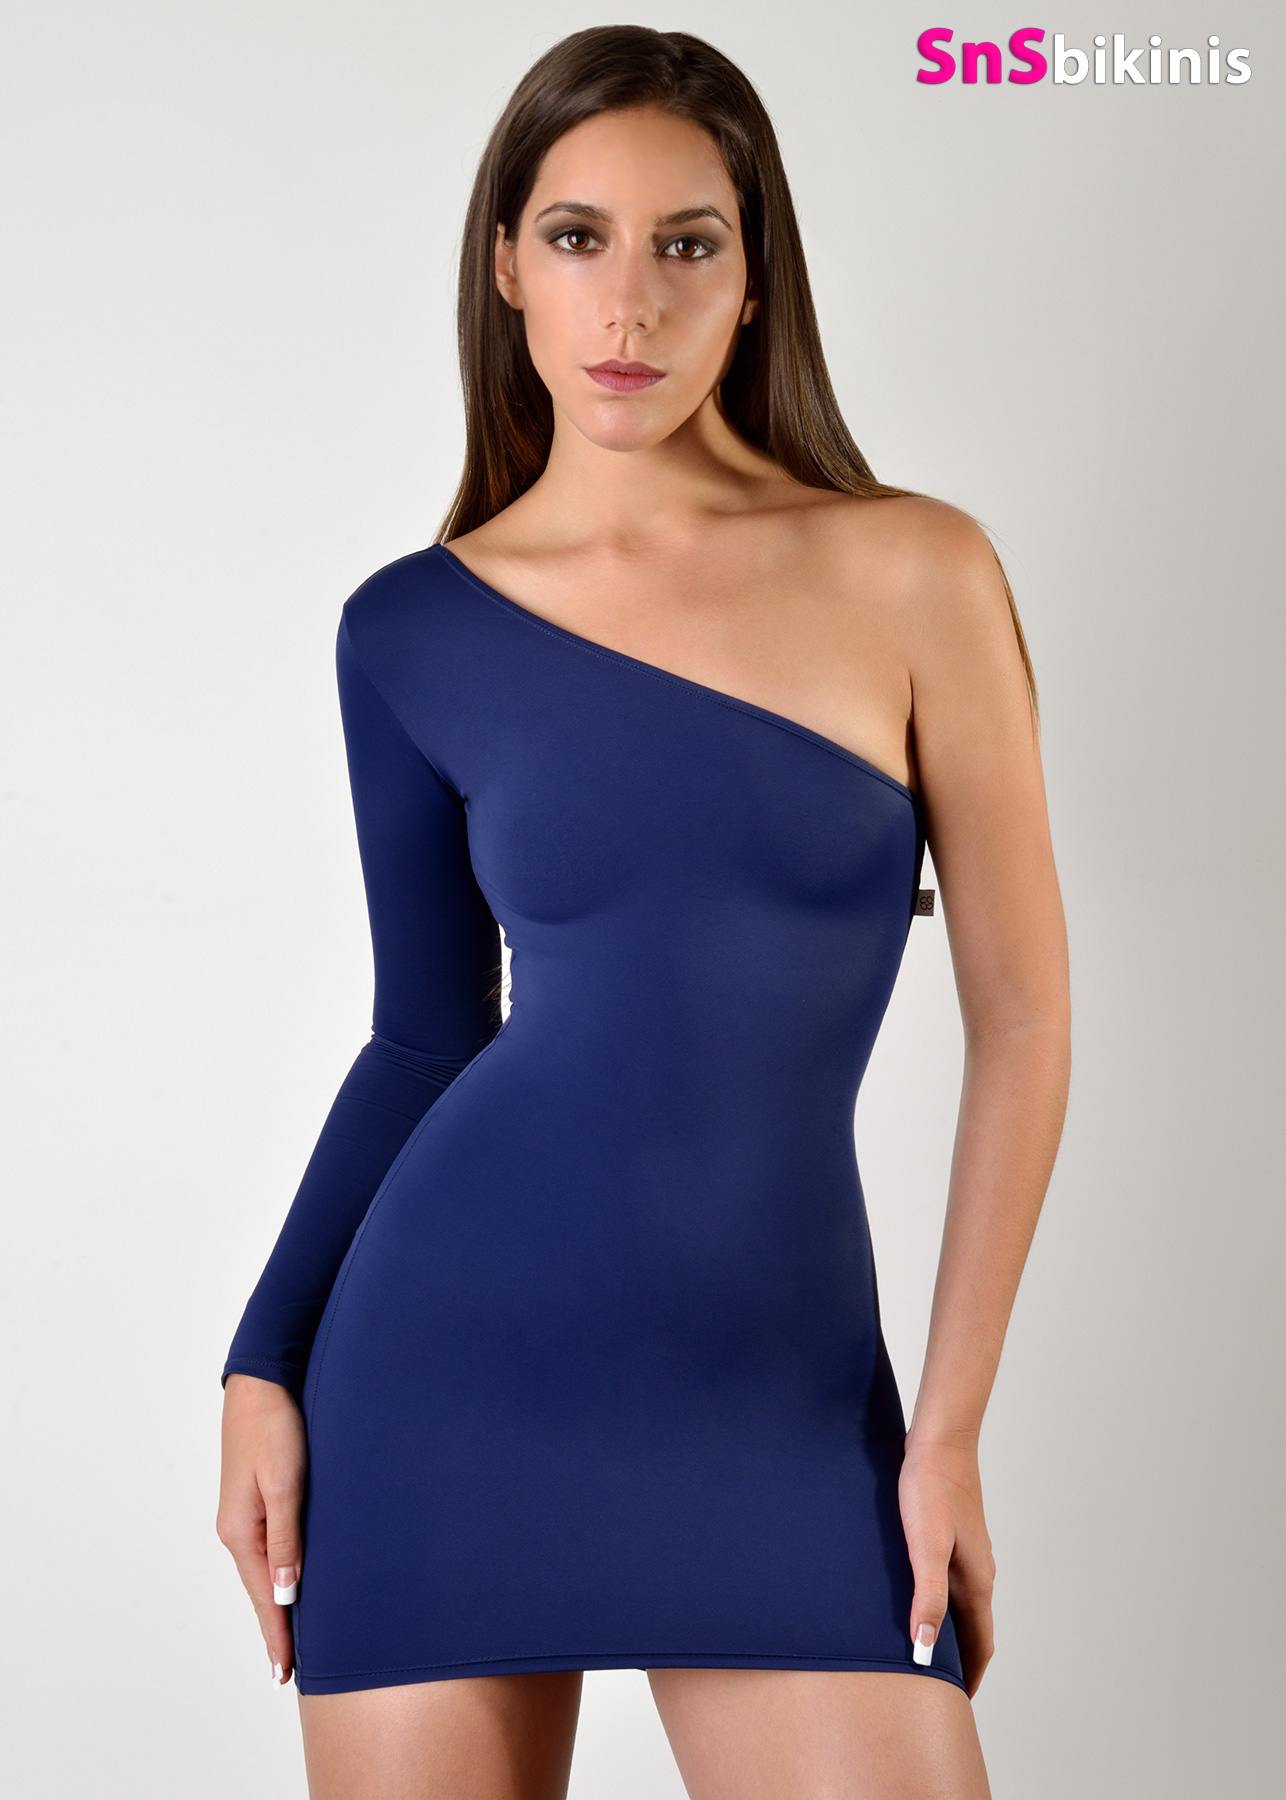 VIOLET Sexy Night Mini Dress [vuml002] - $64.00 ...